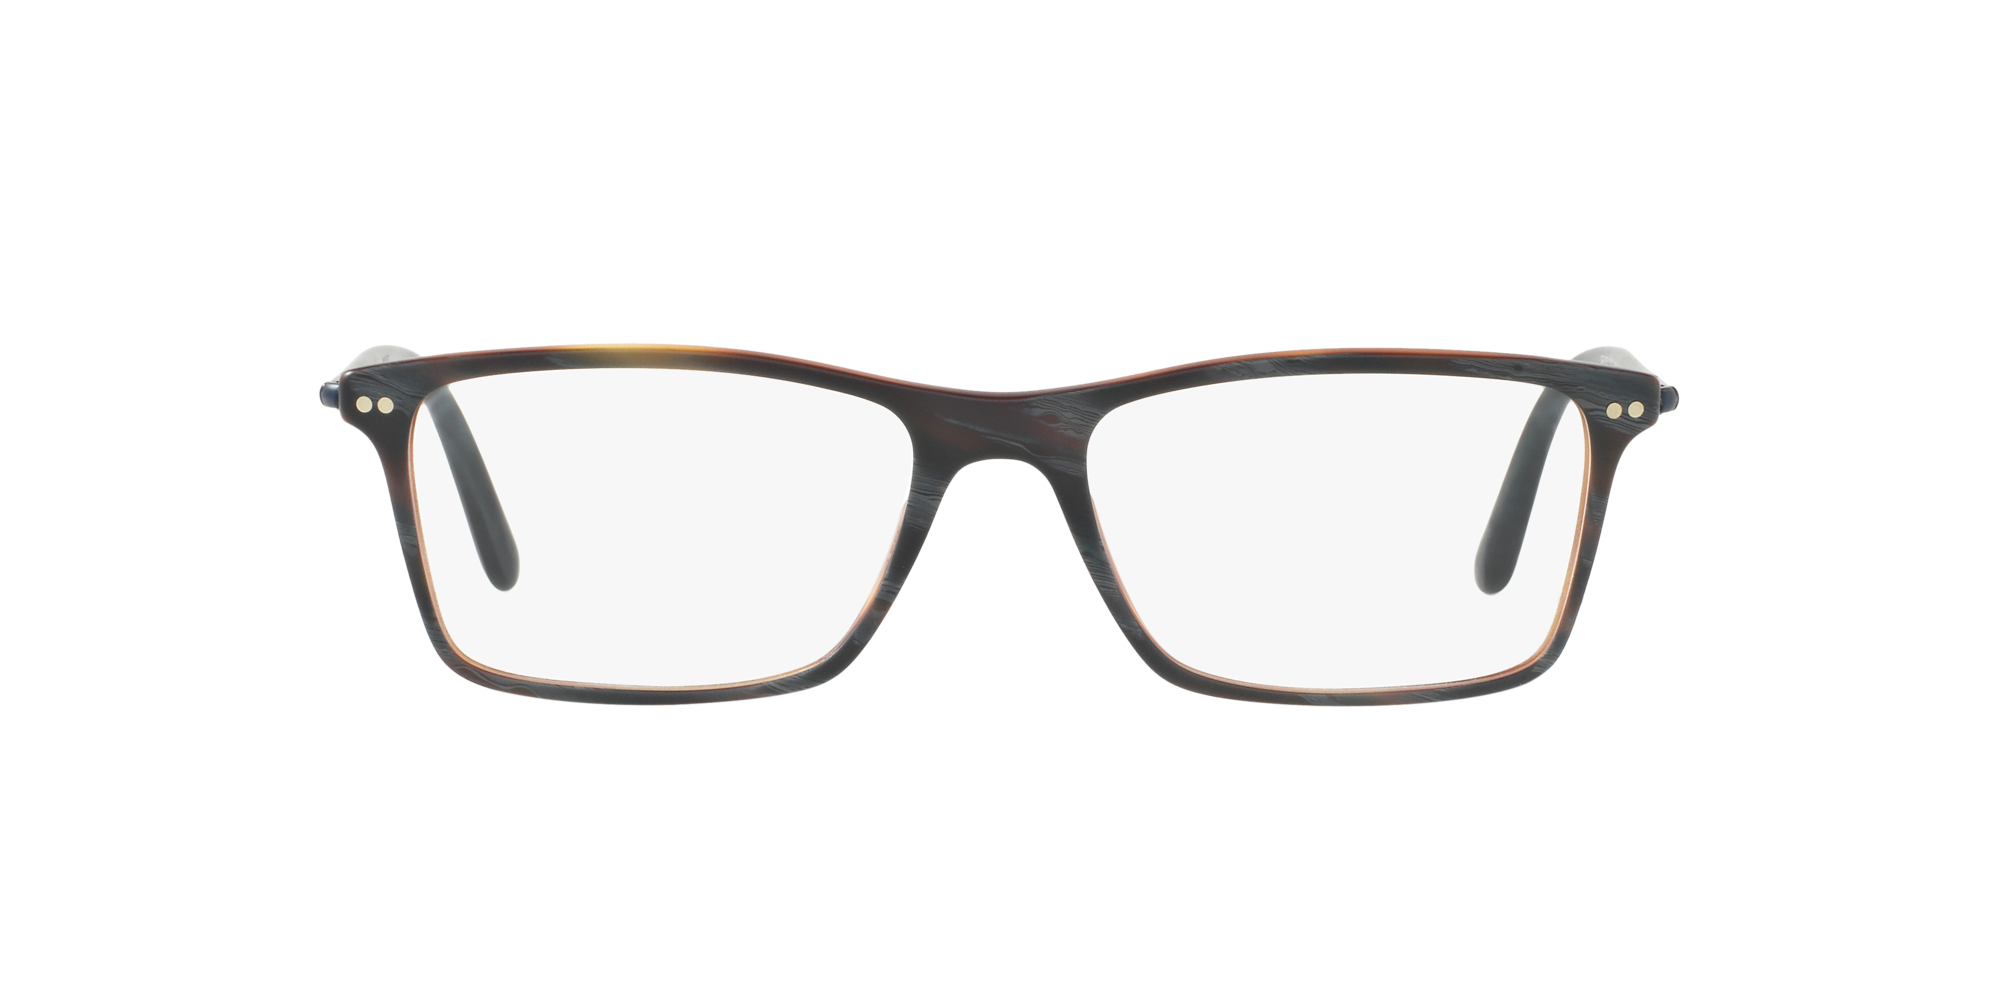 Image for AR7037 from LensCrafters | Glasses, Prescription Glasses Online, Eyewear